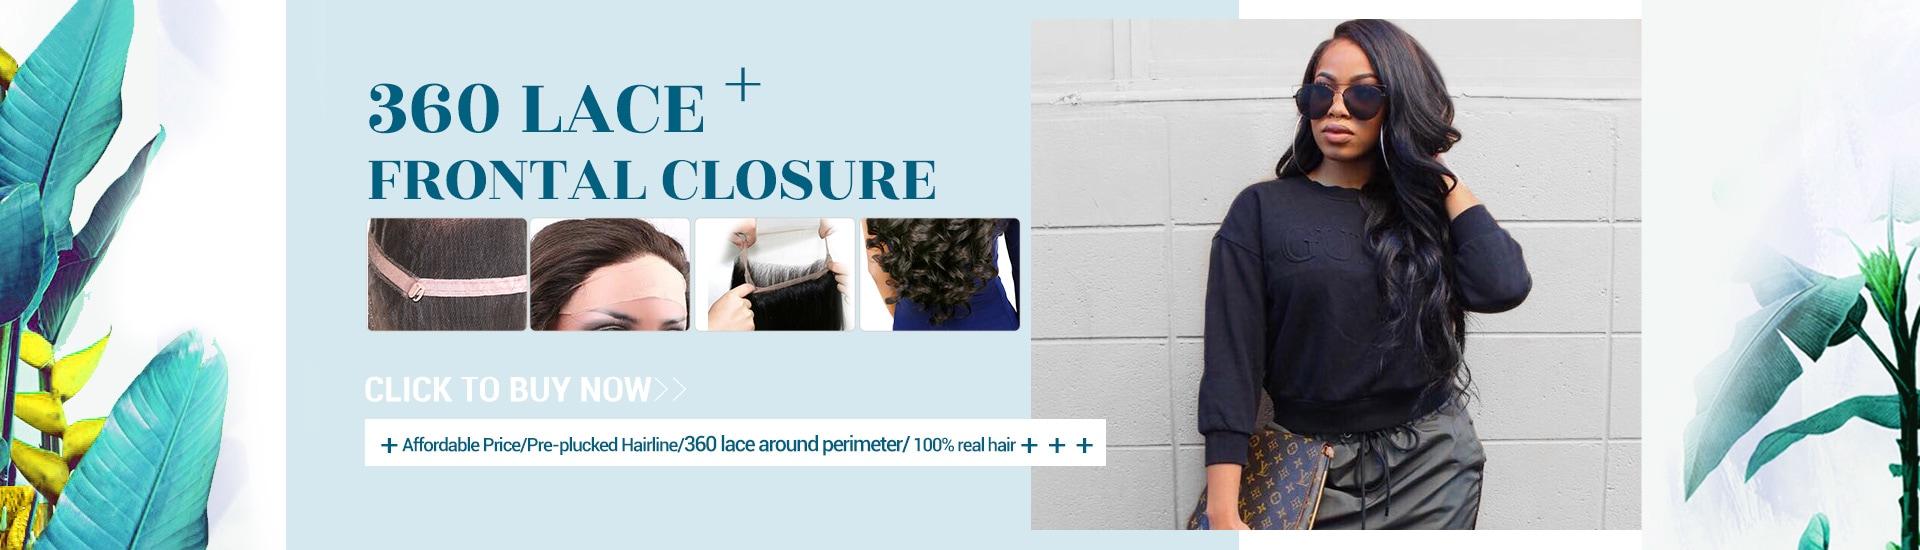 360 lace closure